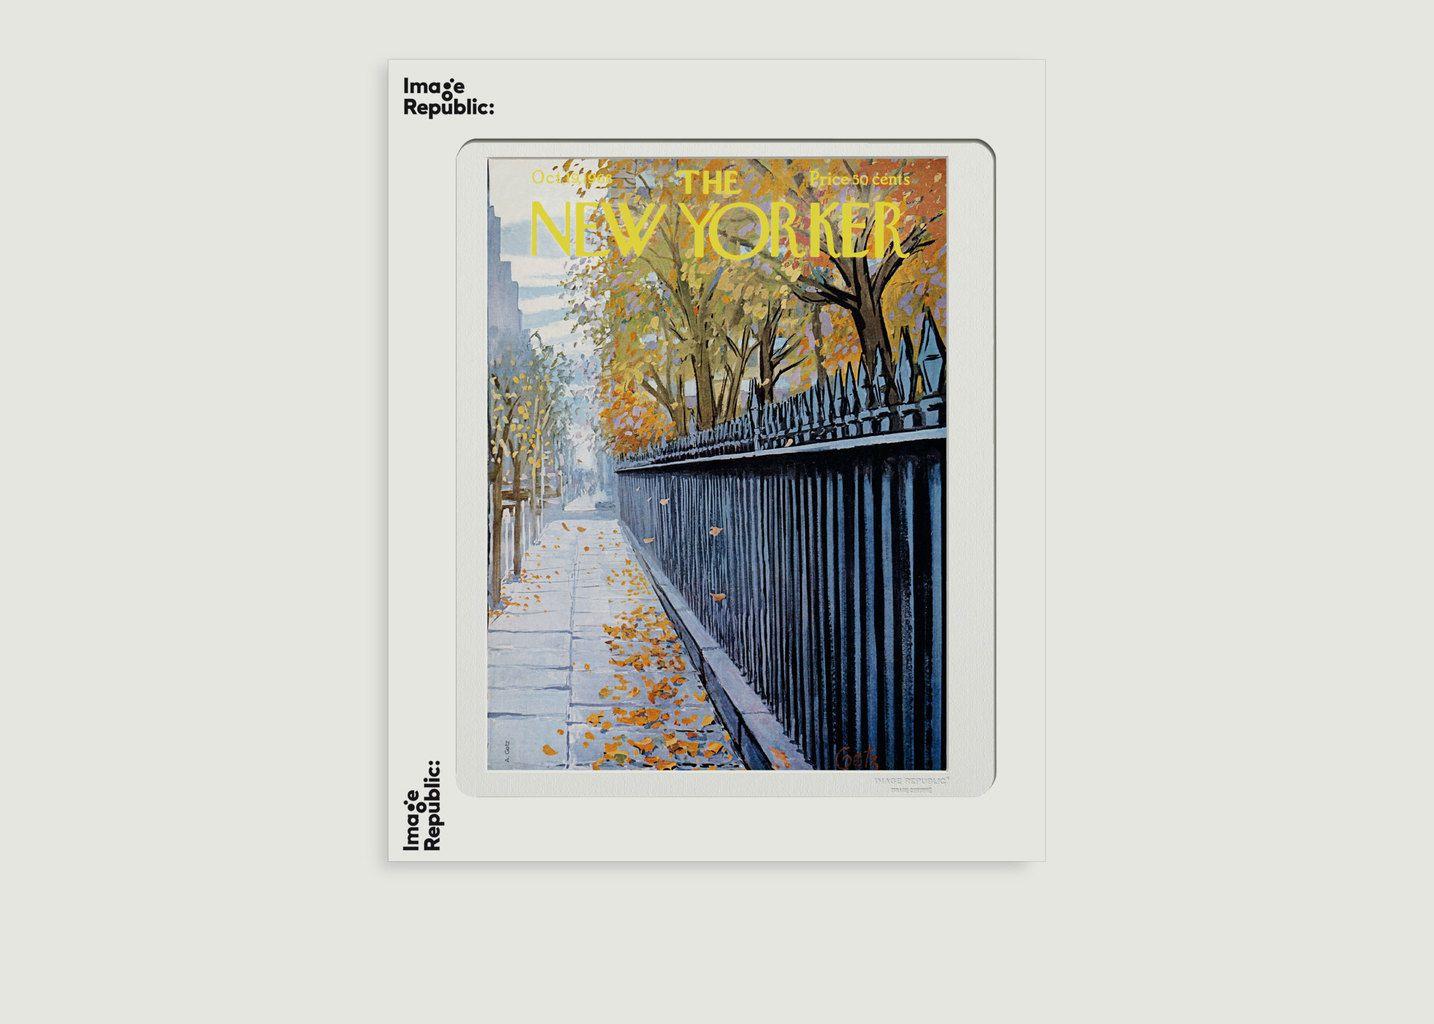 Affiche The New Yorker 77 Getz Autumn 1968 - Image Republic